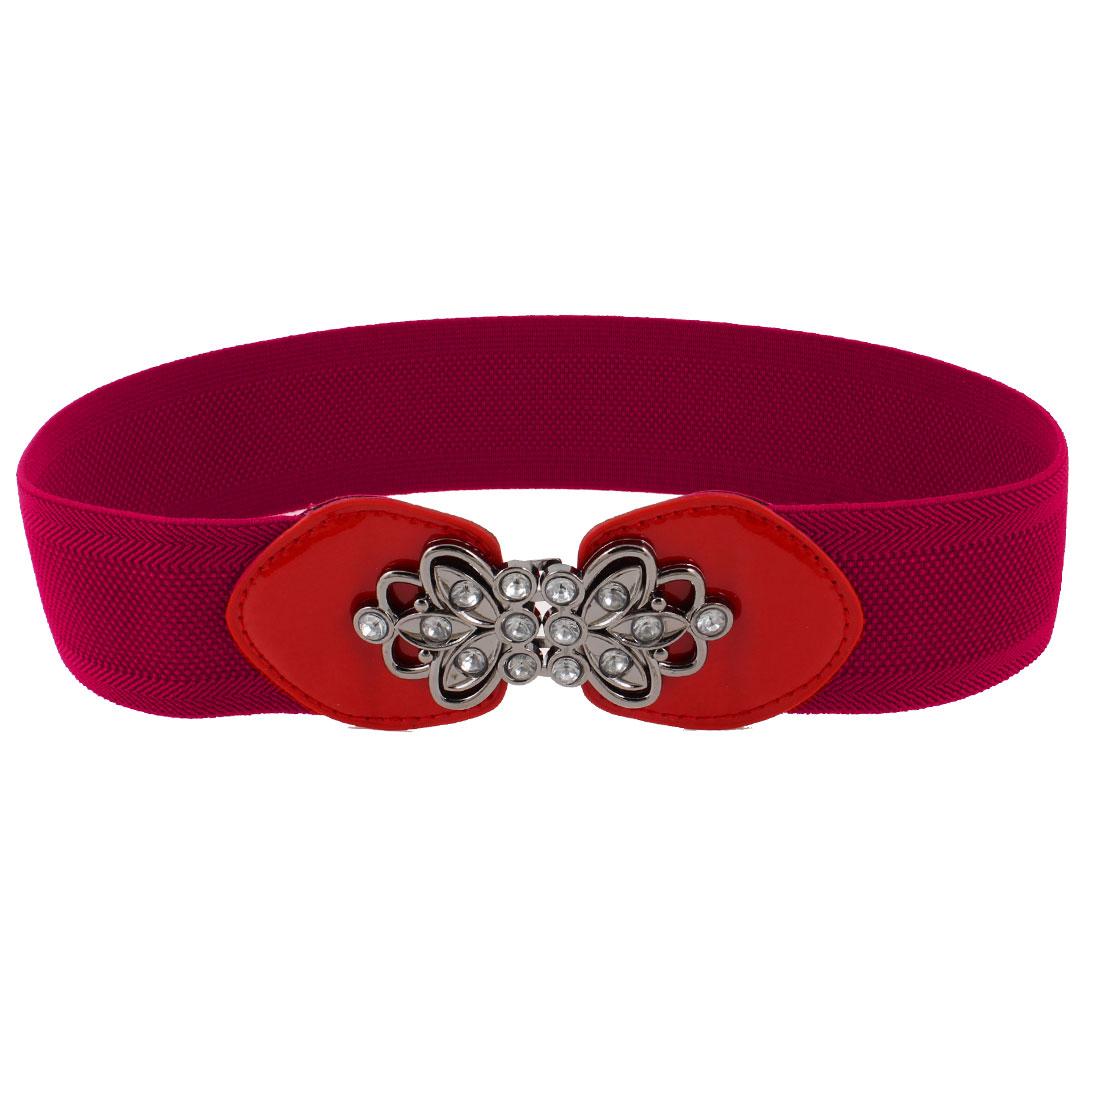 Woman Flower Decor Interlocking Buckle Texture Elastic Cinch Waist Belt Red